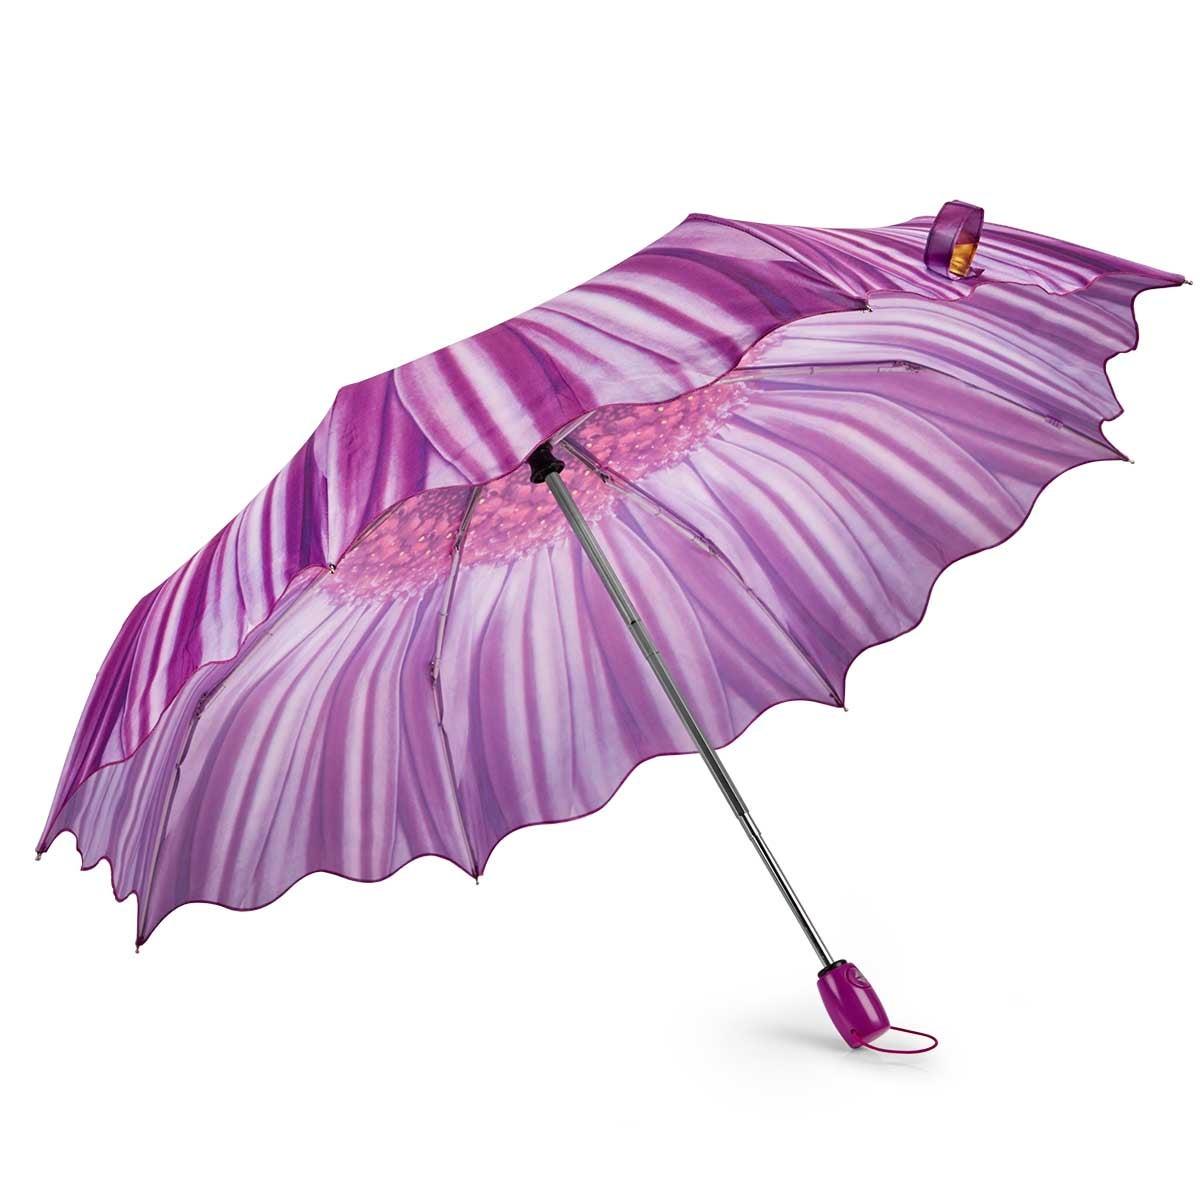 Austin House Telescopic purple umbrellas